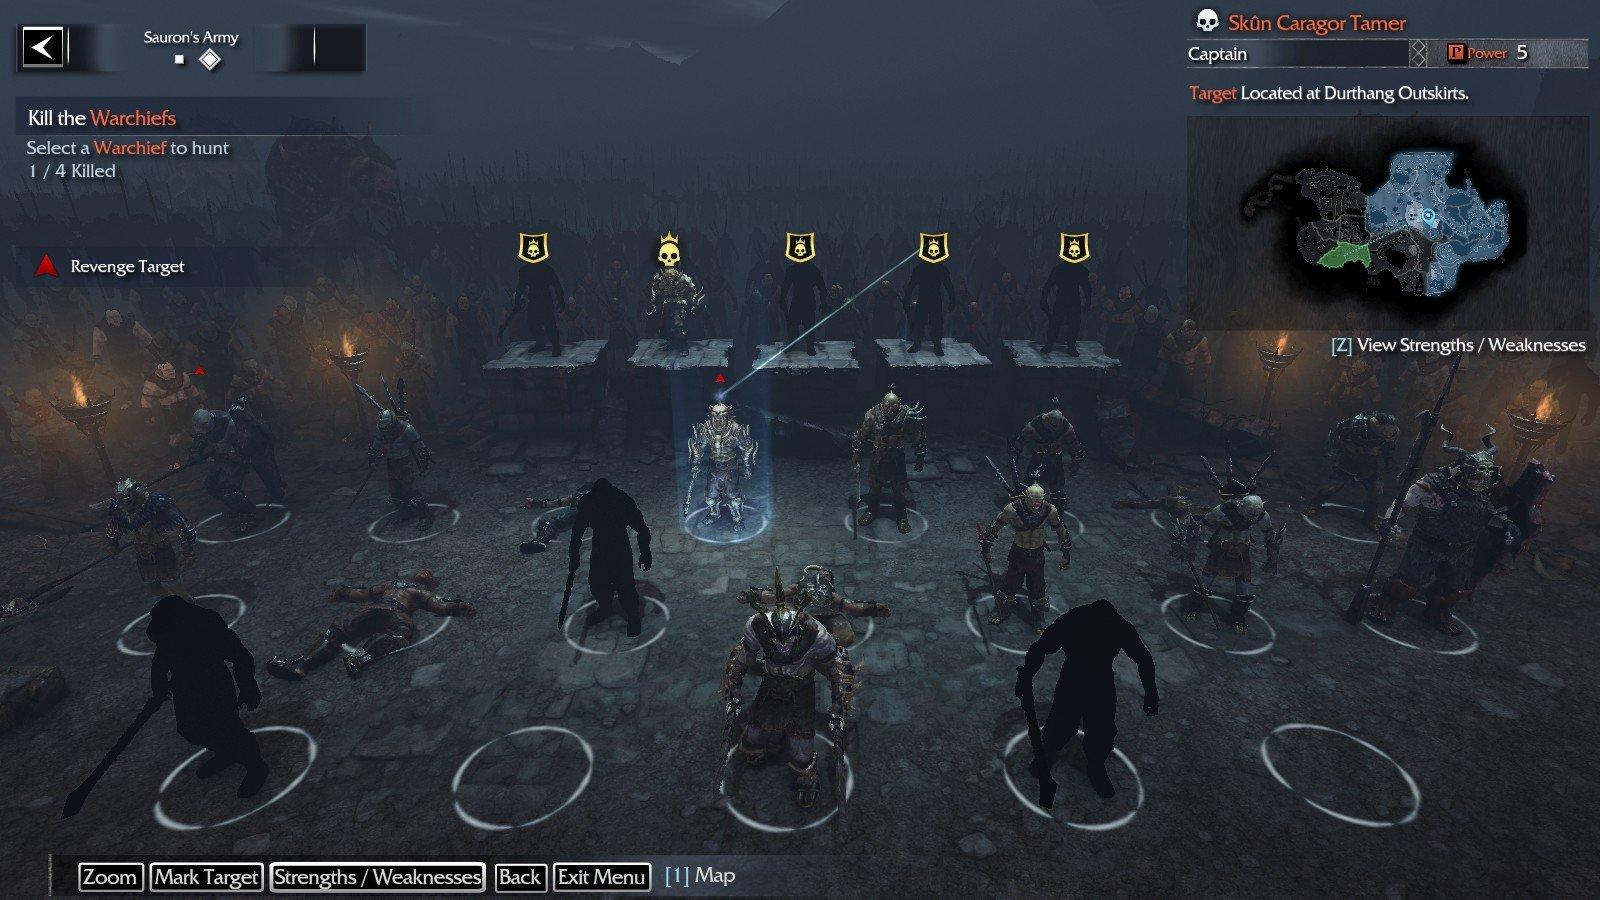 Сам себе Саурон. Рецензия на Middle-earth: Shadow of Mordor - Изображение 5